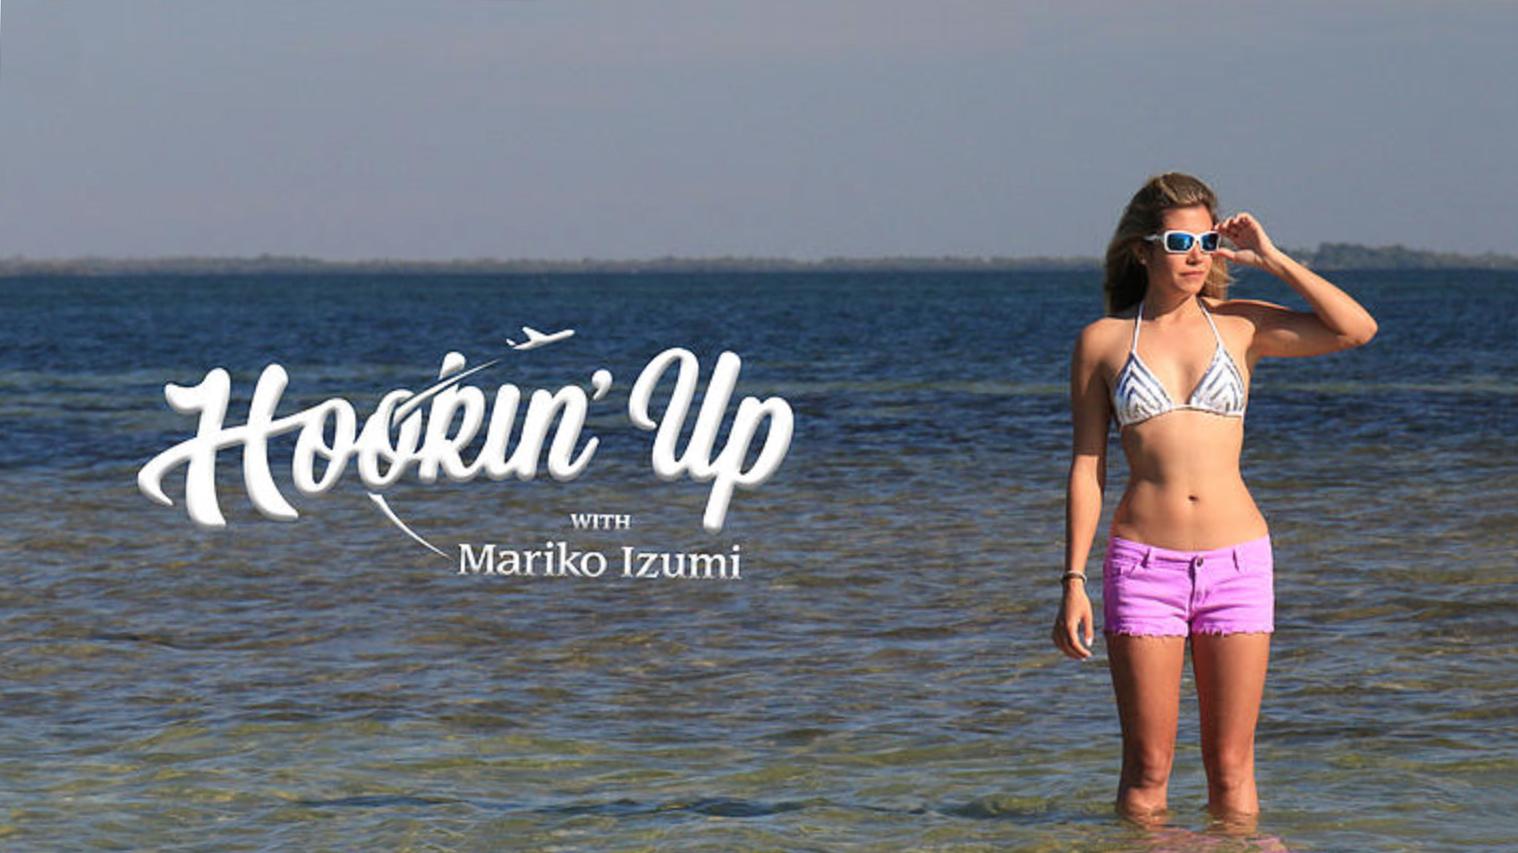 Hookin' Up with Mariko Izumi - TV Series Episodes